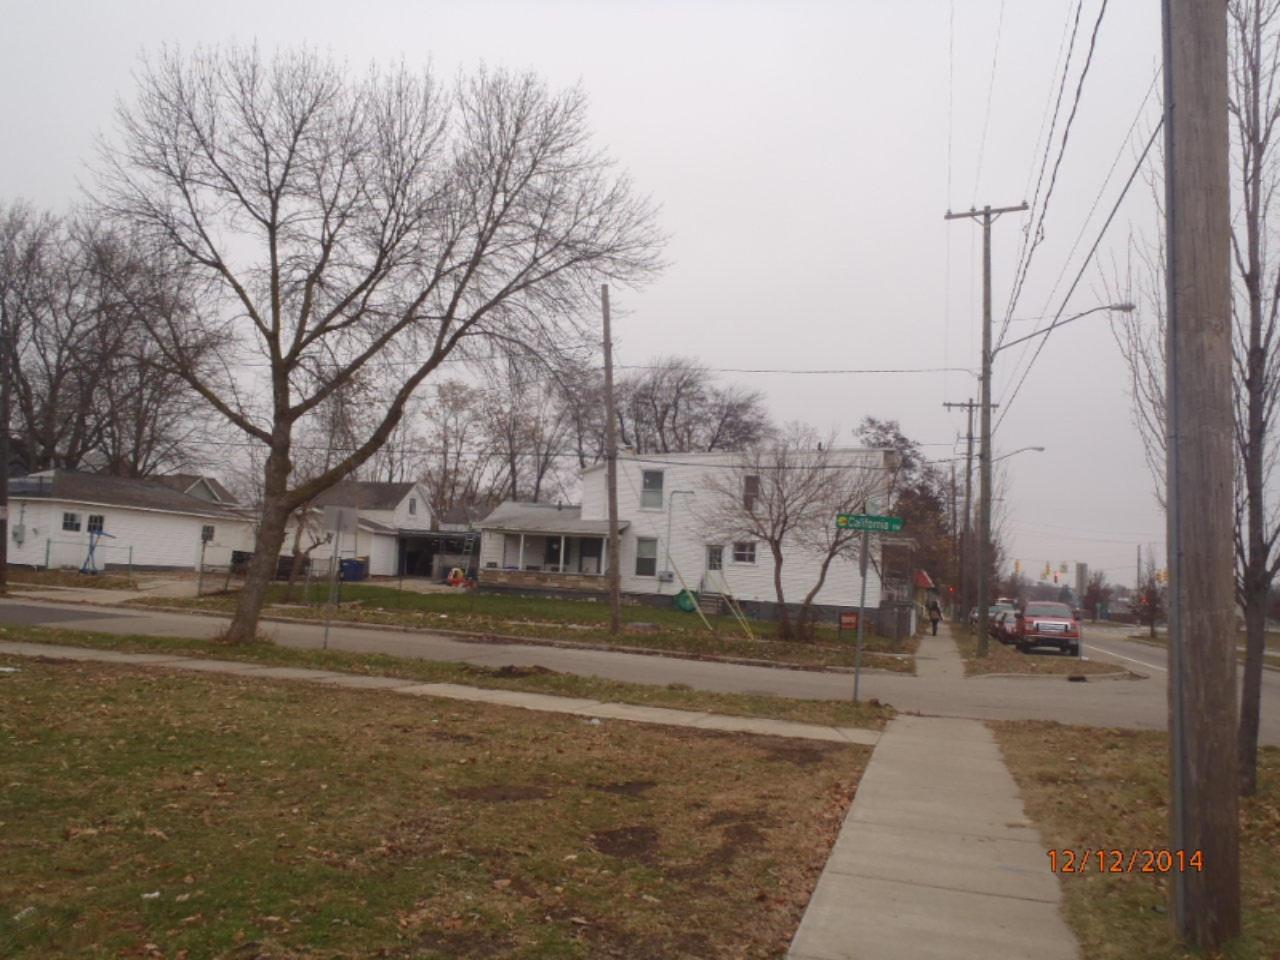 103 Seward Avenue Nw, Grand Rapids MI 49504 - Photo 1